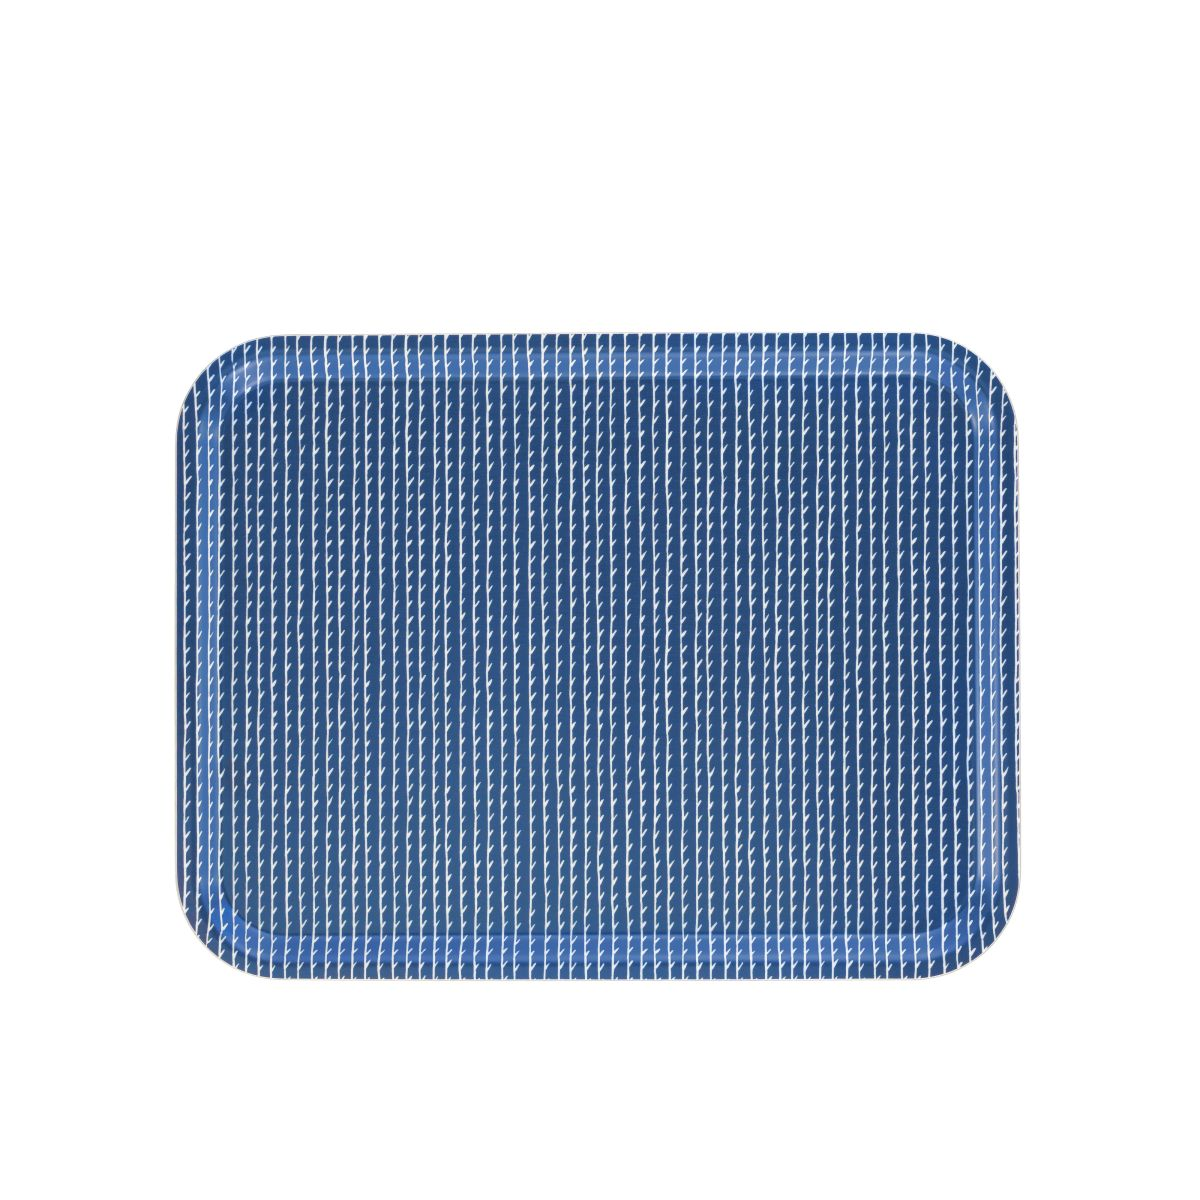 Rivi Tray blue_white large_F_web